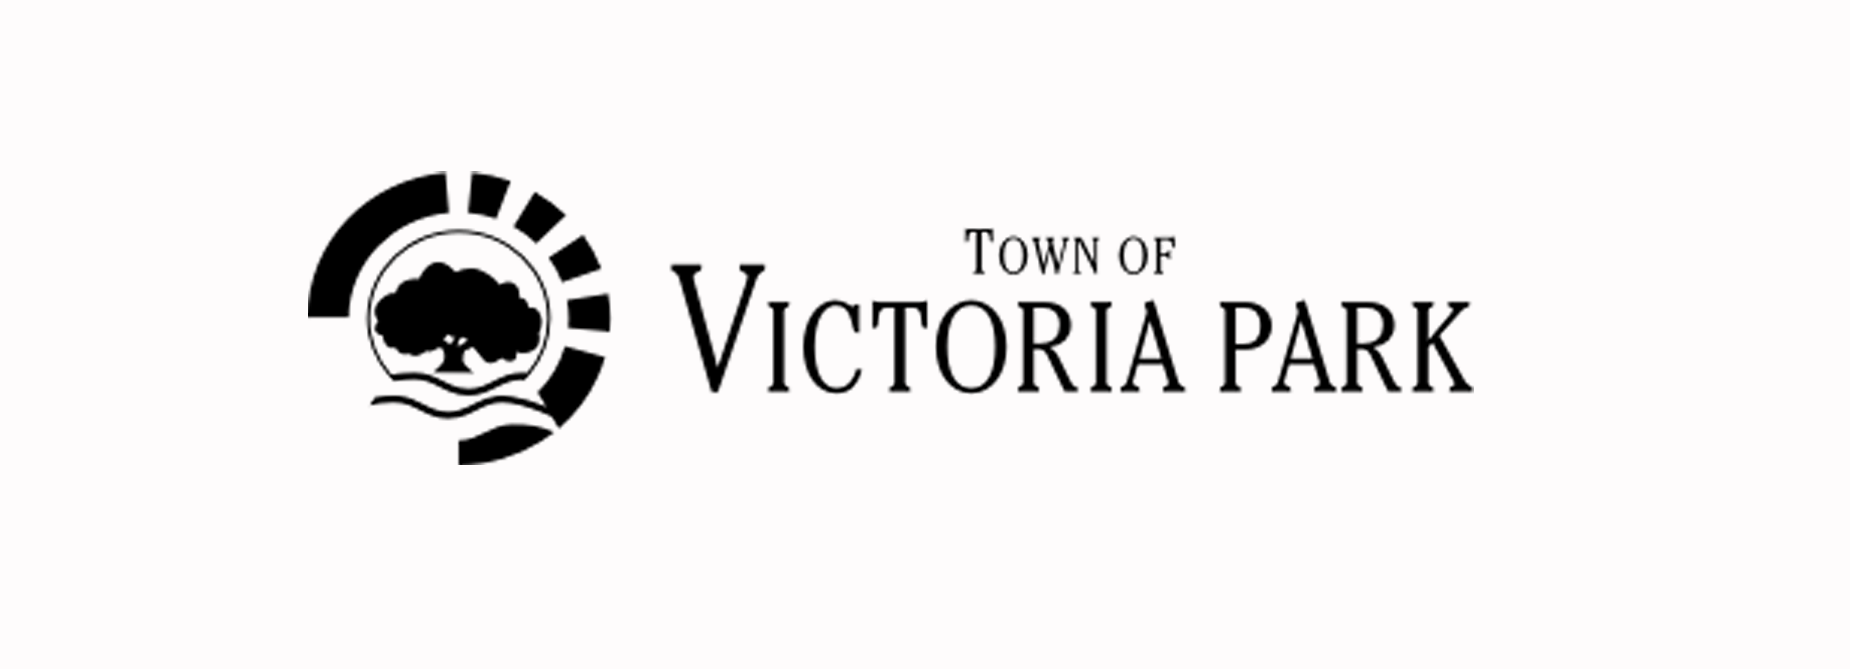 Town Of Victoria Park Logo